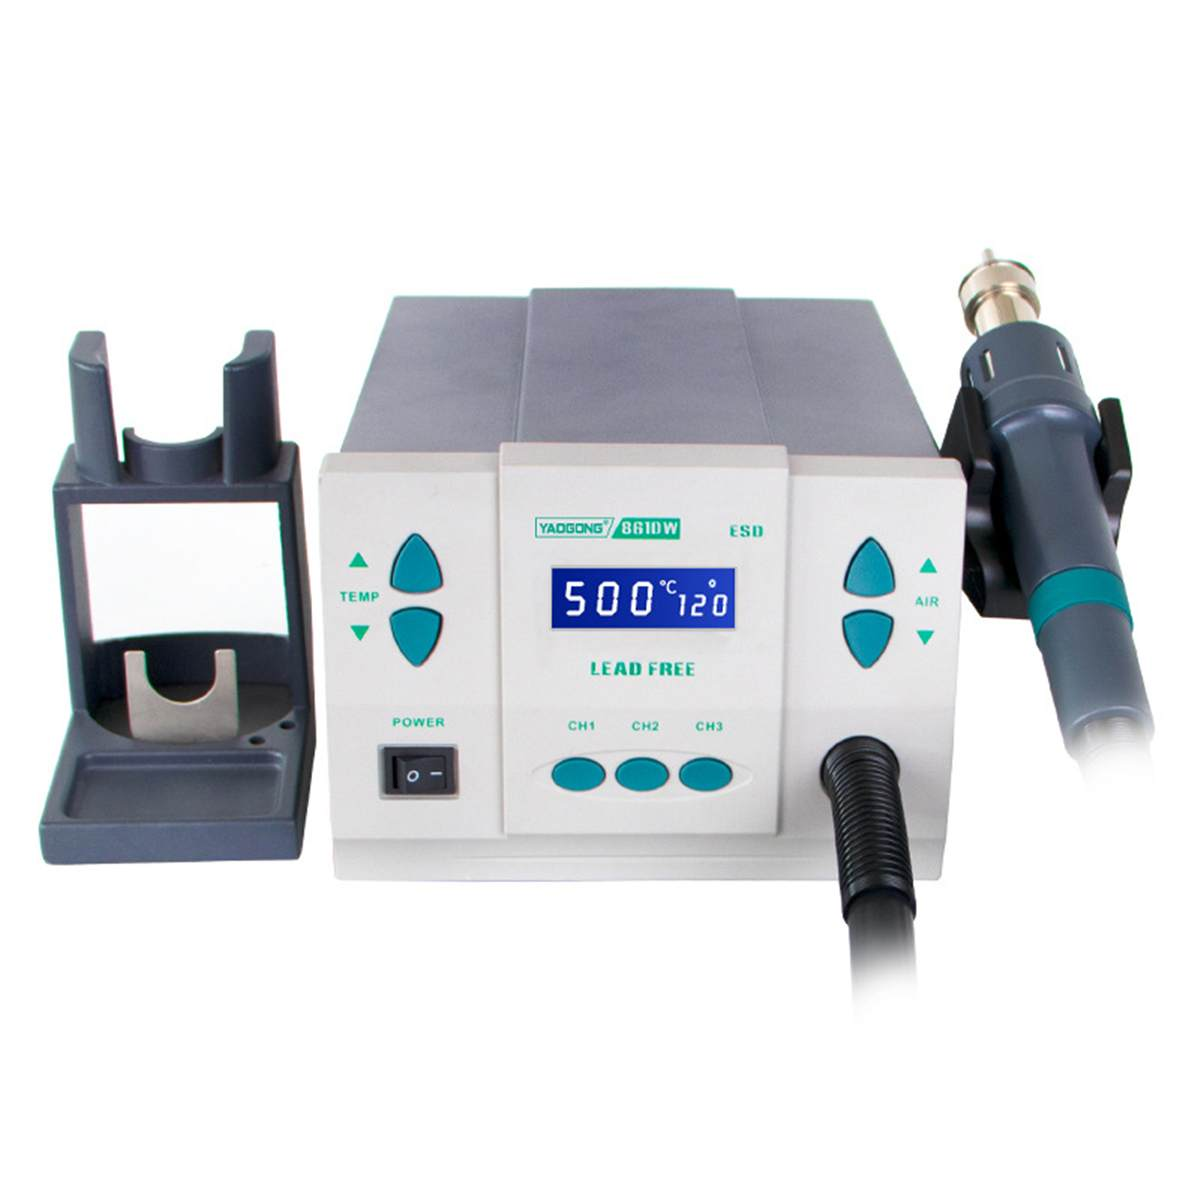 Original 1000W220/110V 861DW Heat Gun Lead Free Hot Air Soldering Station Microcomputer Temperature Rework Station 3nozzle